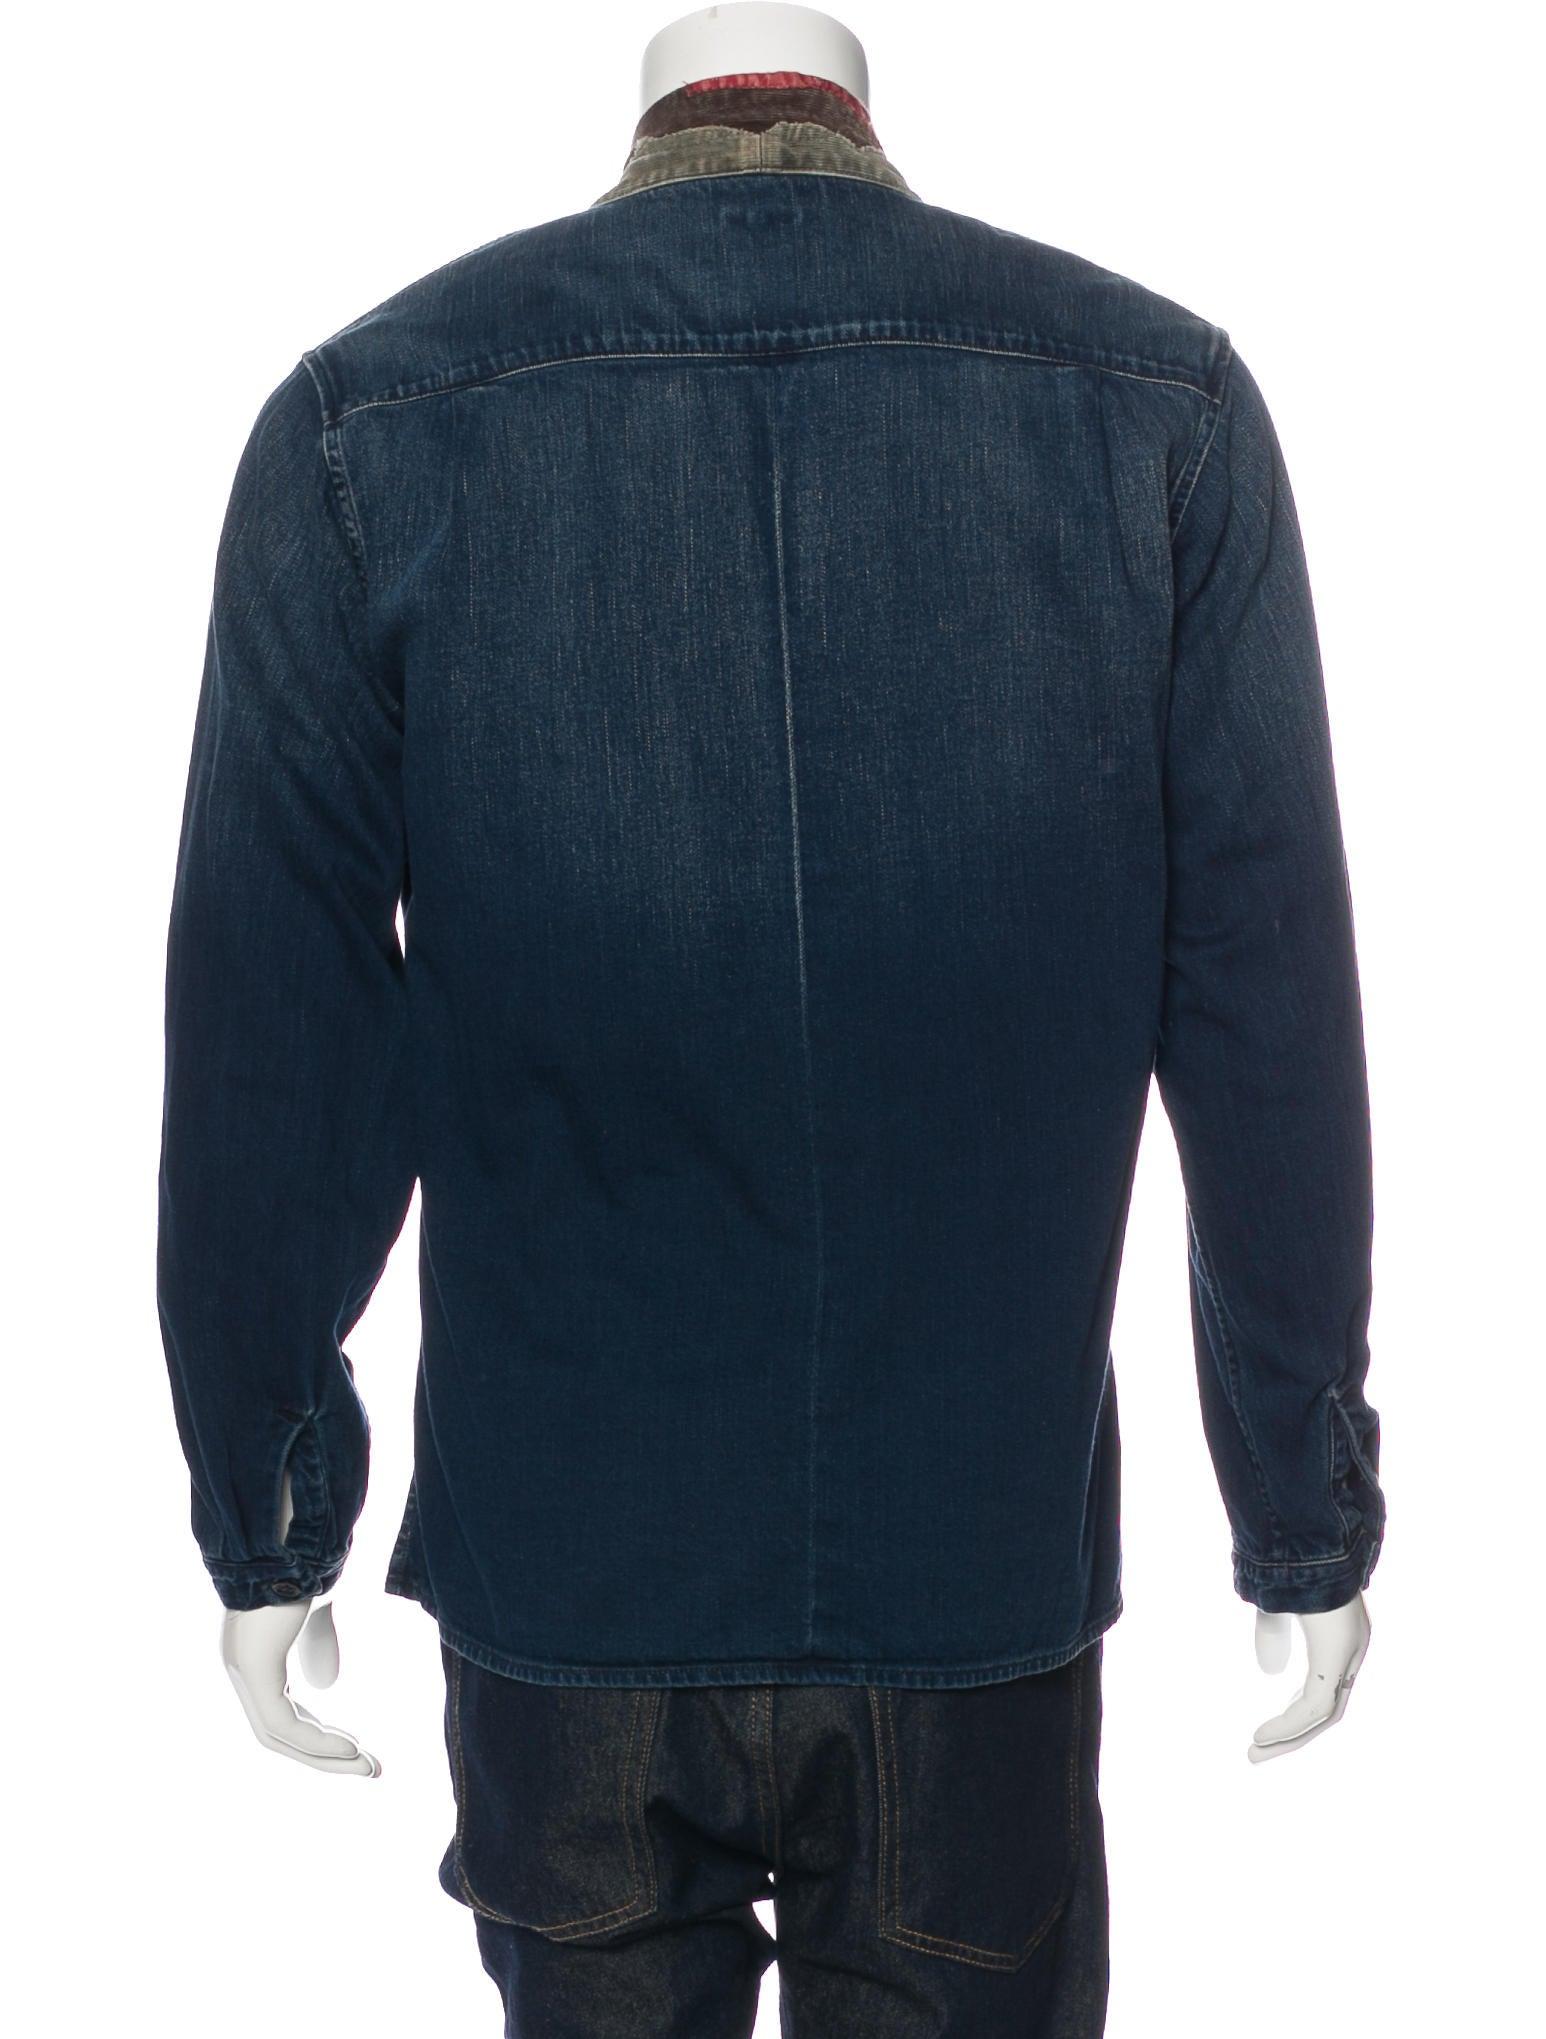 Kapital Jubbahn Distressed Shirt Jacket Clothing